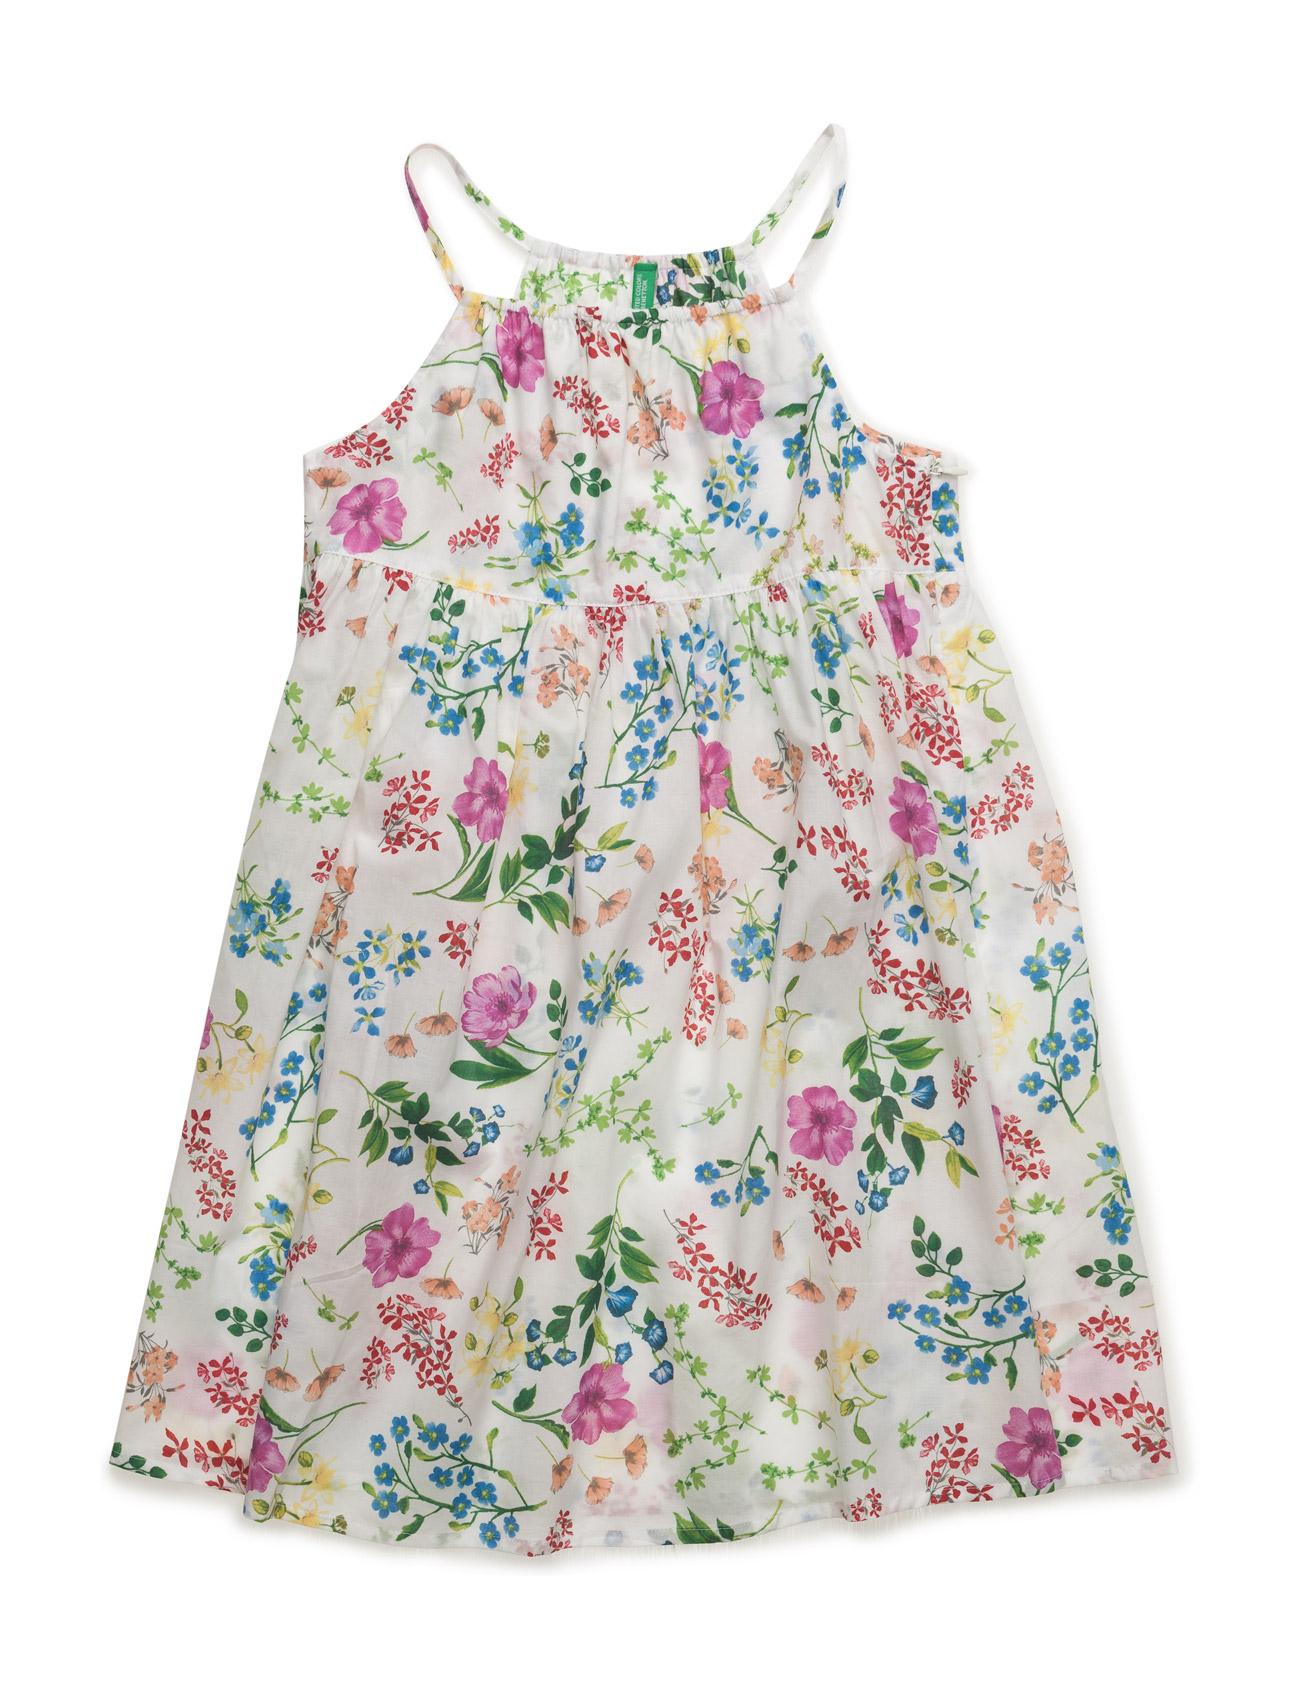 Dress United Colors of Benetton Kjoler til Børn i hvid